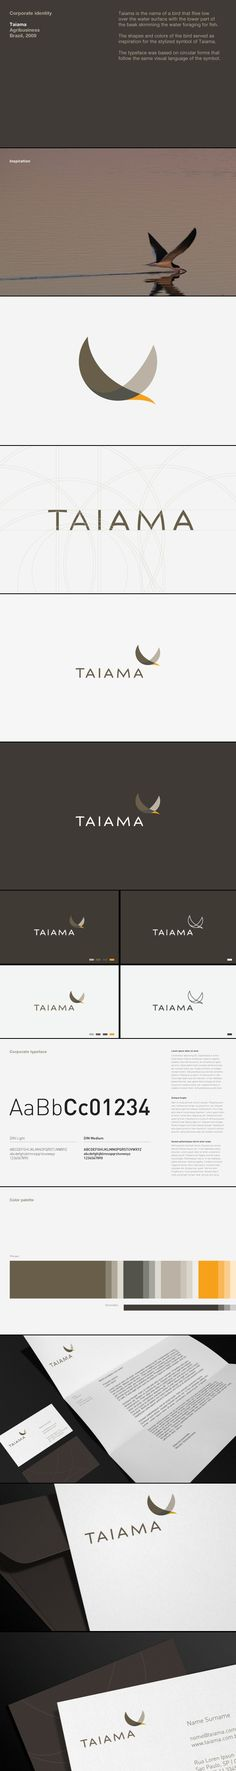 Taiama Logo Design, Inspiration & Corporate Identity via Beahnce